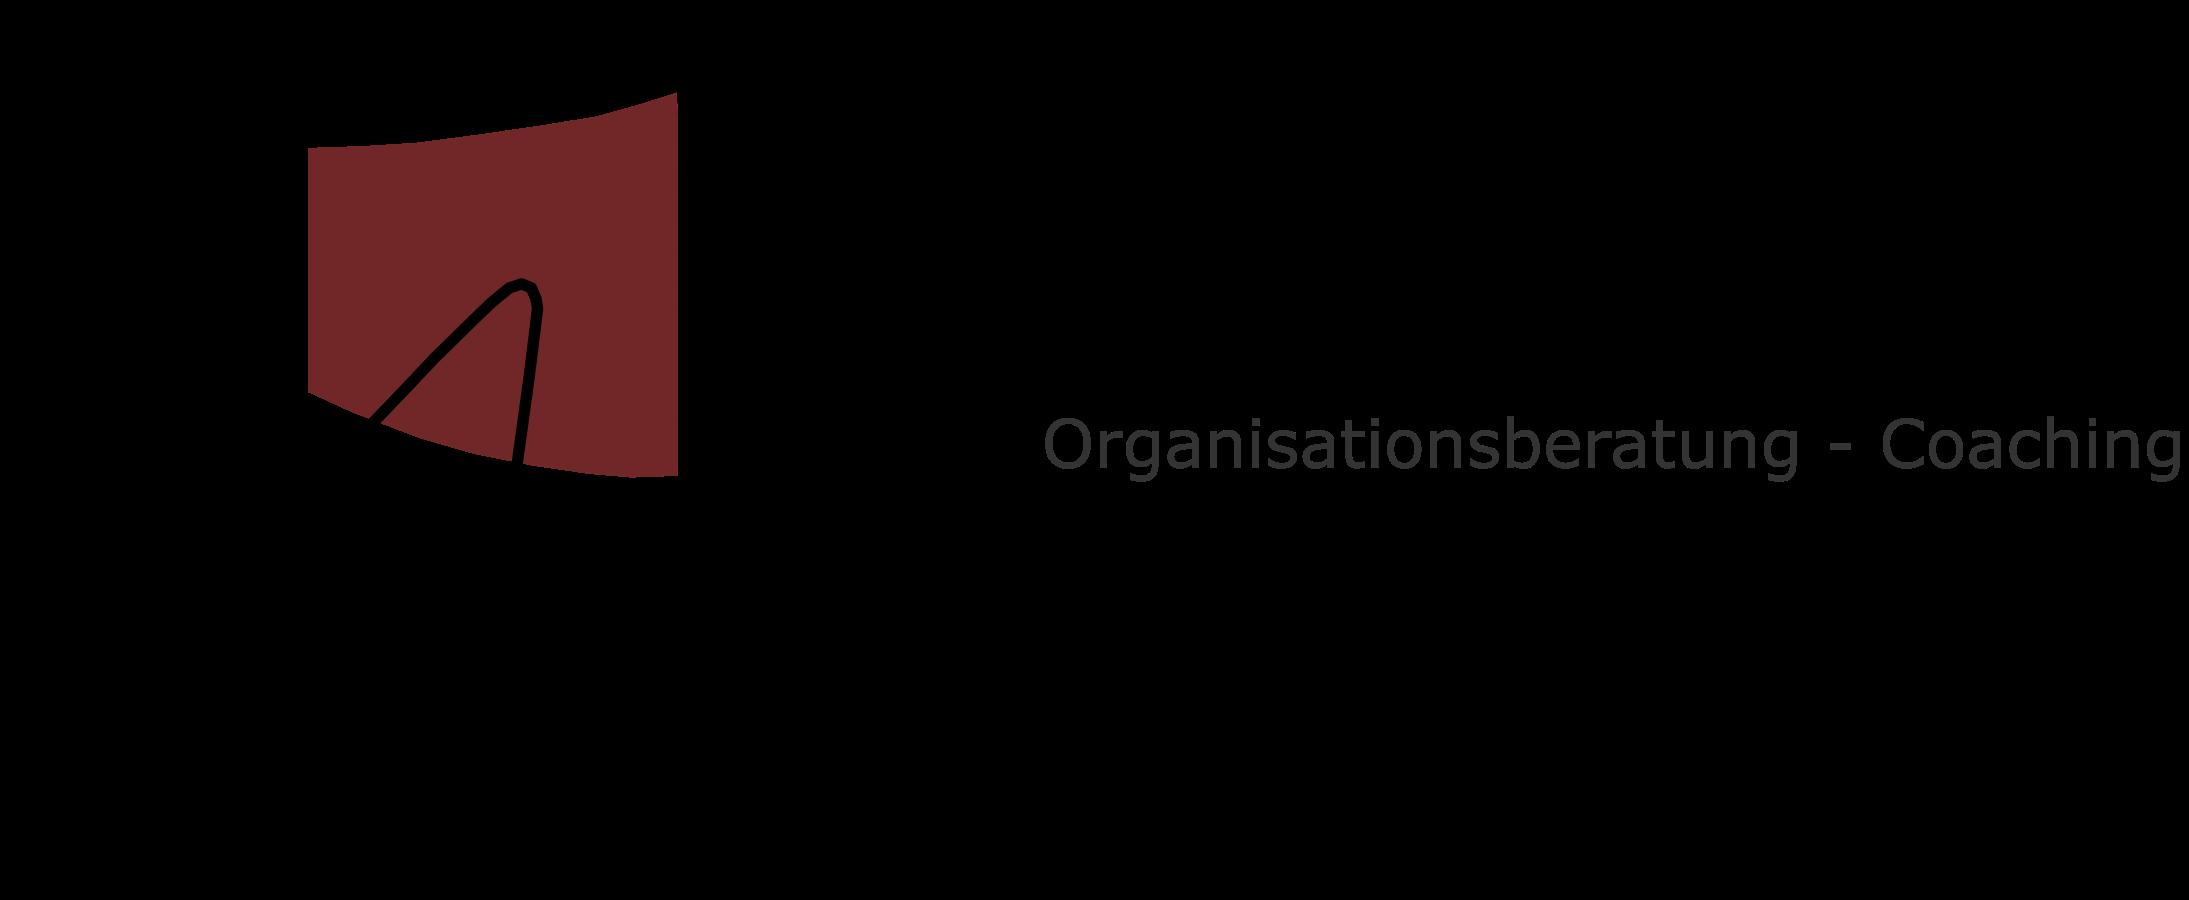 Organisationsberatung.Coaching – Angelika Cyllok